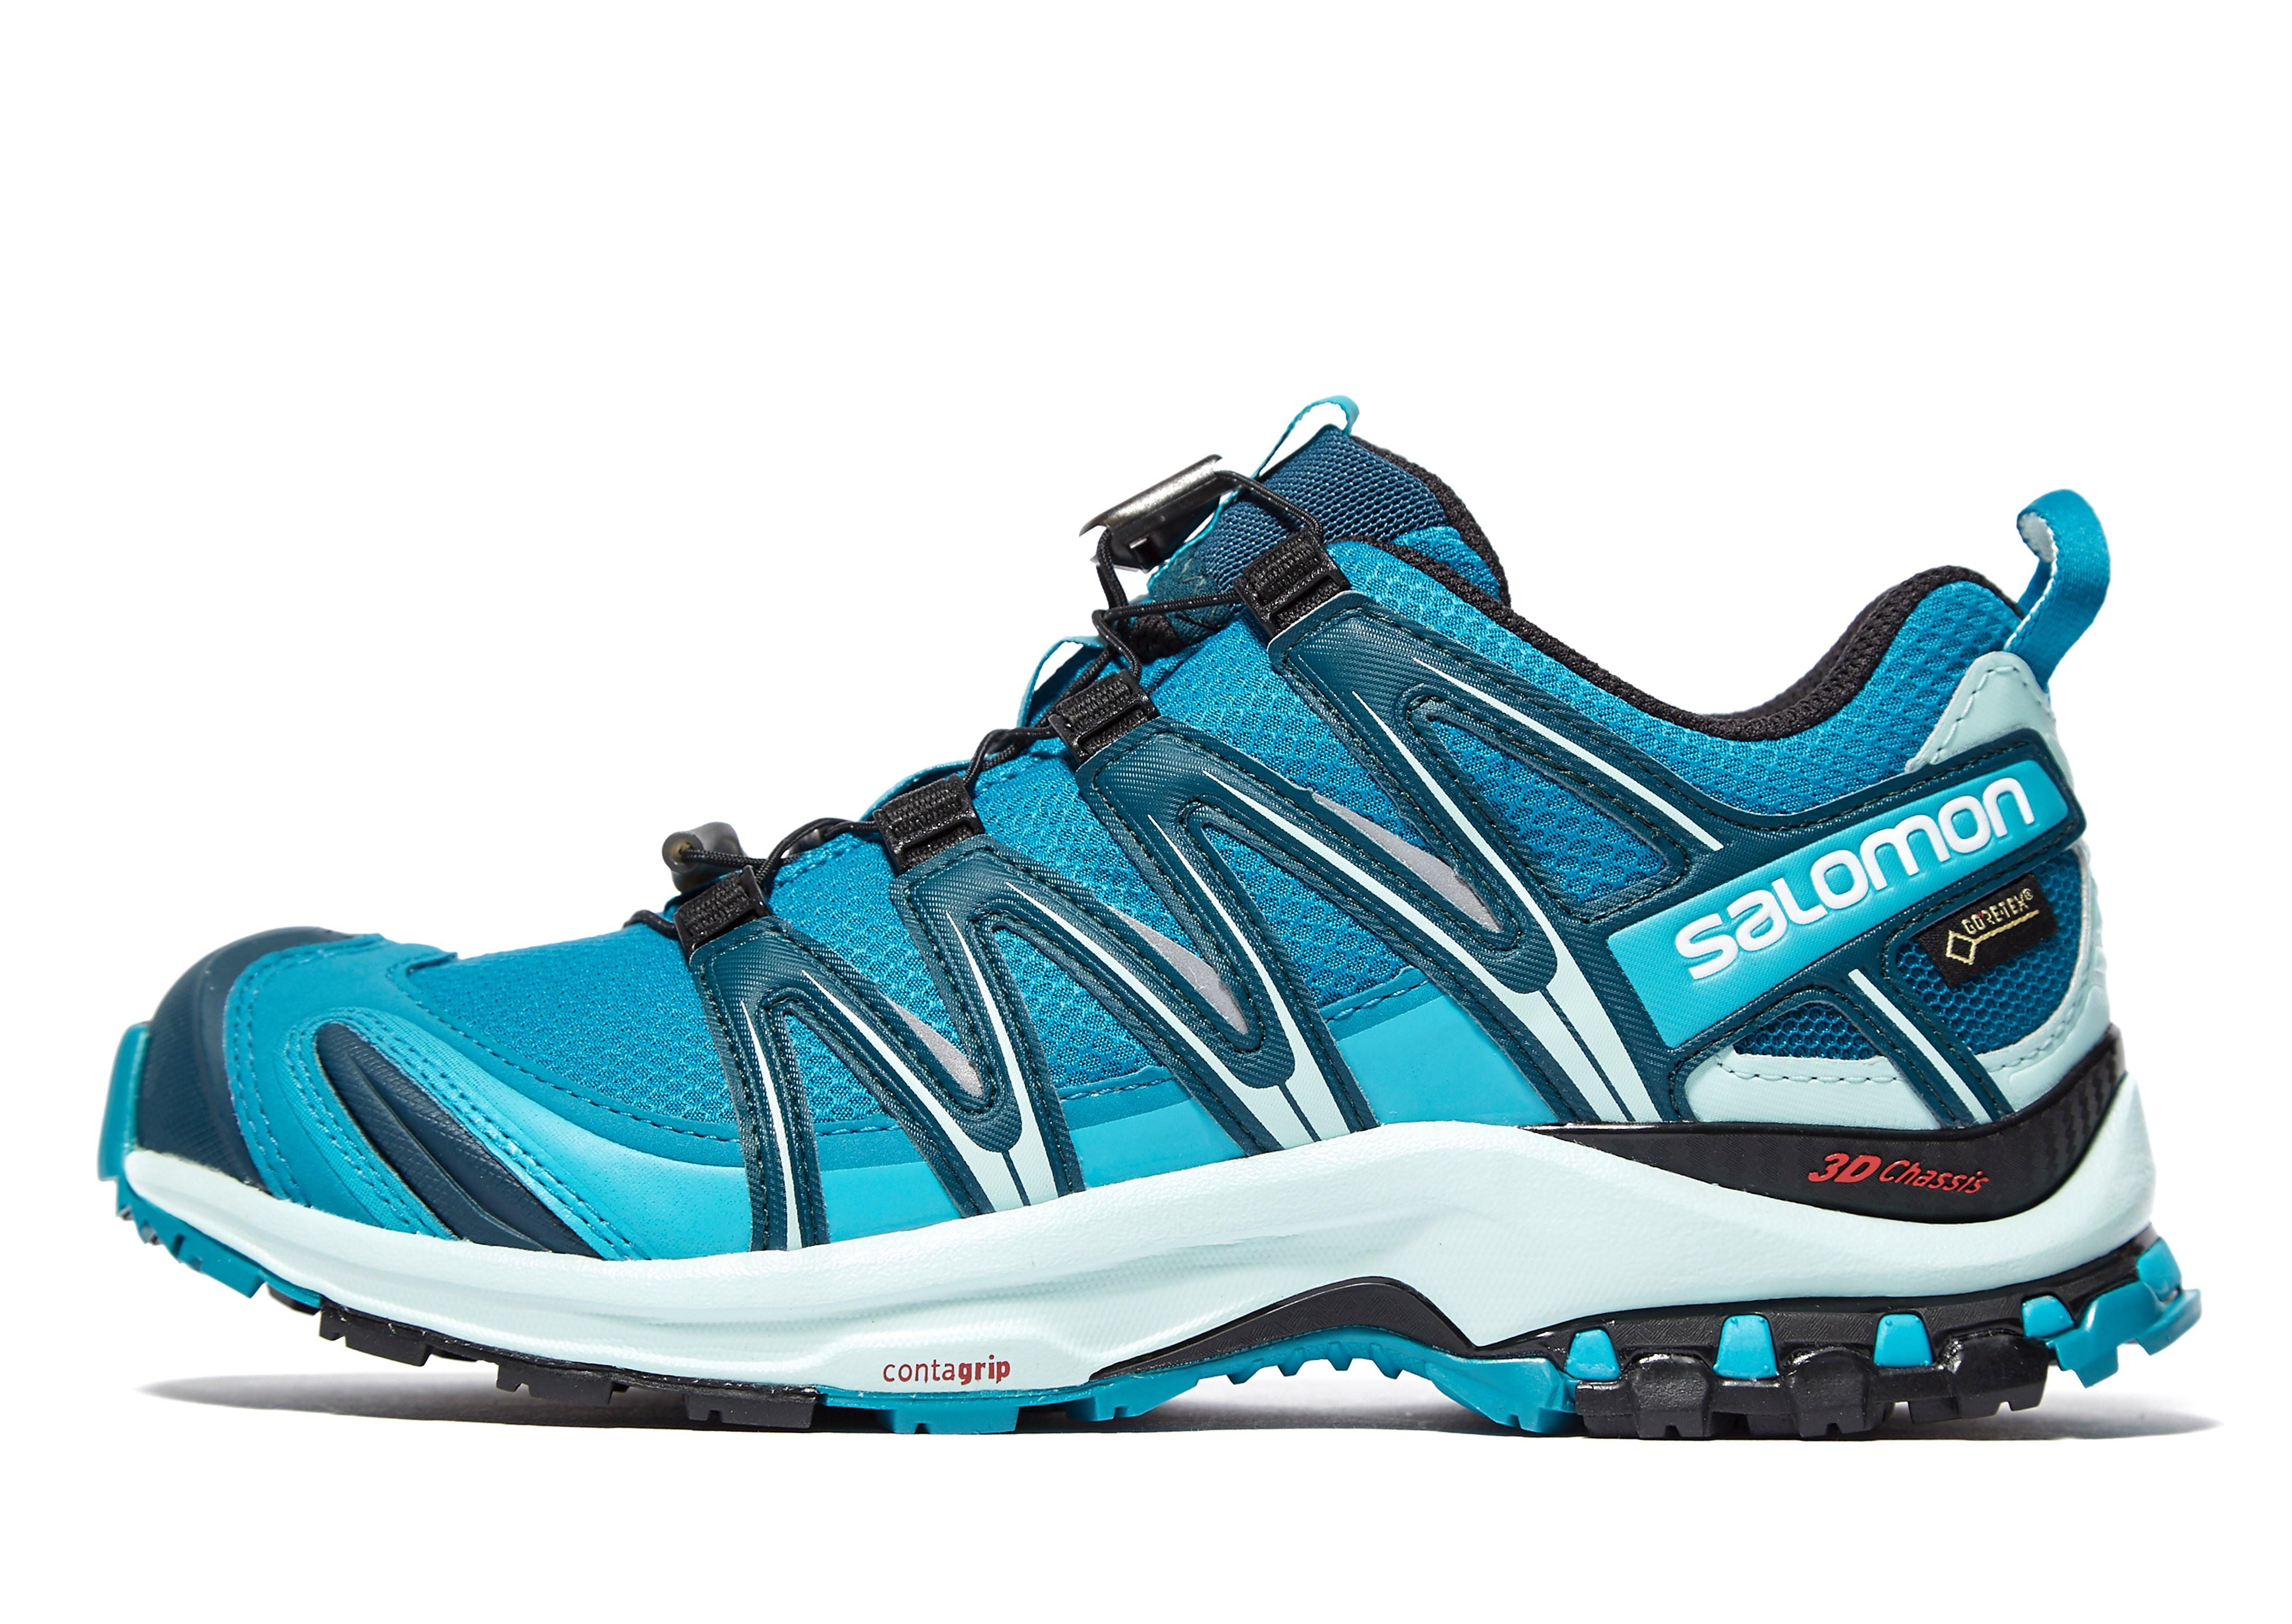 Salomon XA Pro 3D GTX Trail Running Shoes Women's